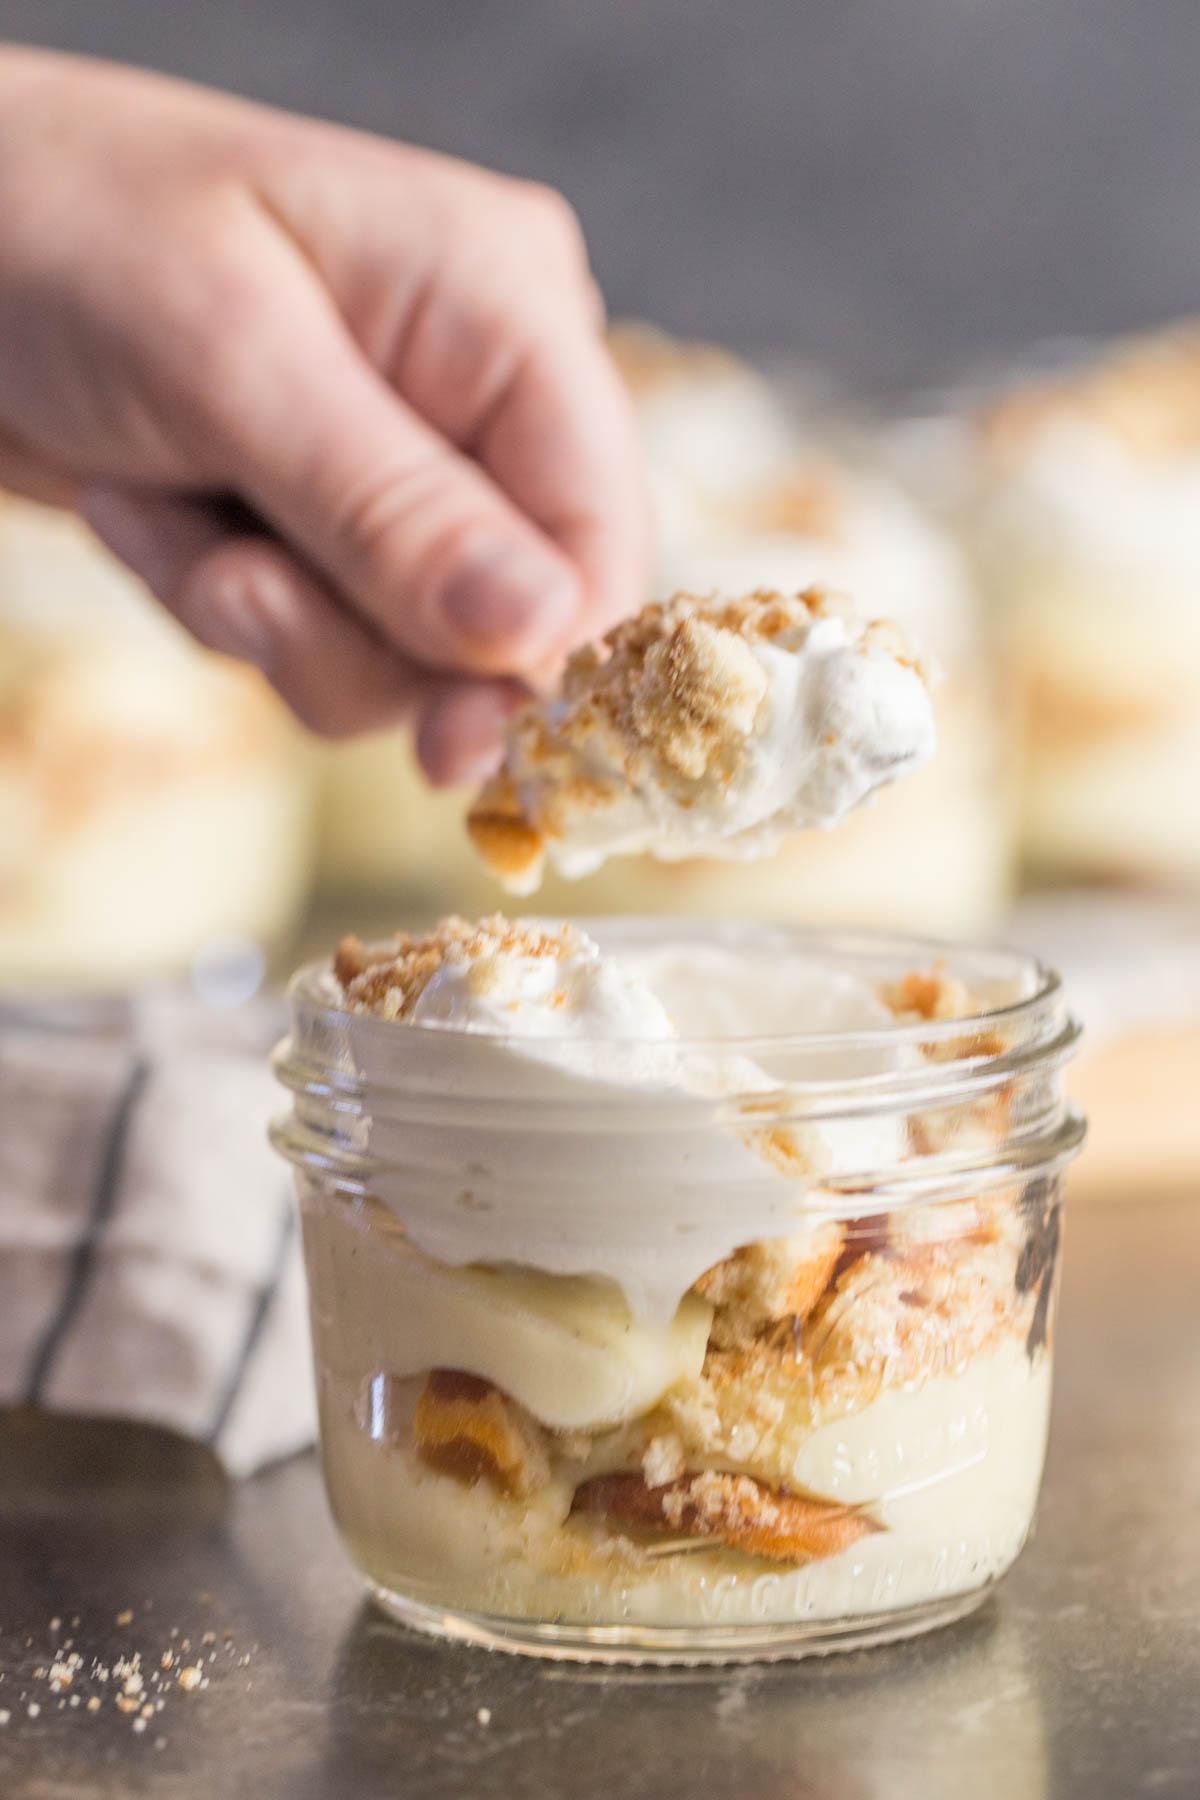 Spoonful of banana pudding above jar